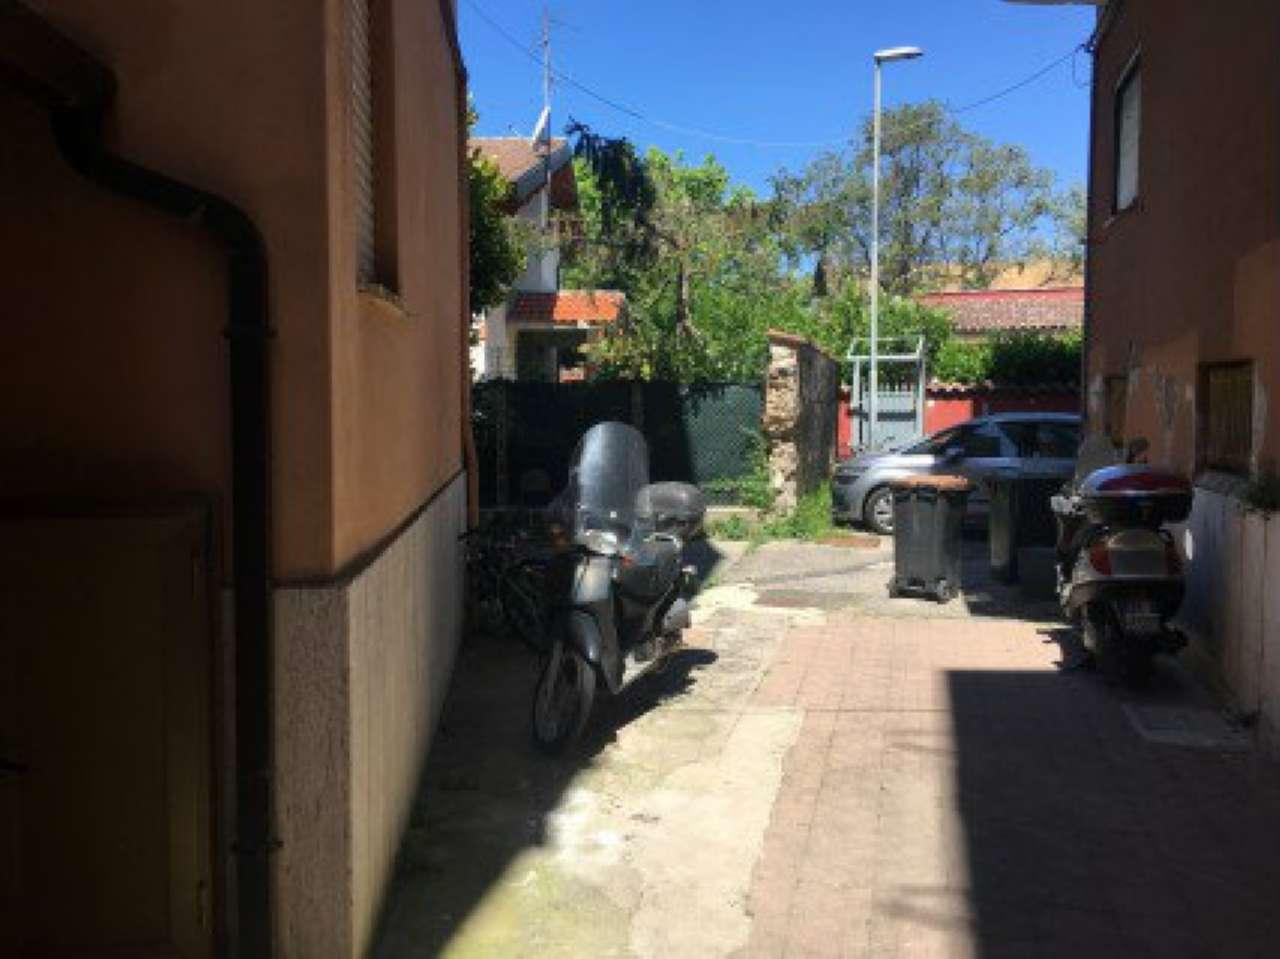 Bilocale, Via Don Morosini, Terracina, foto 17